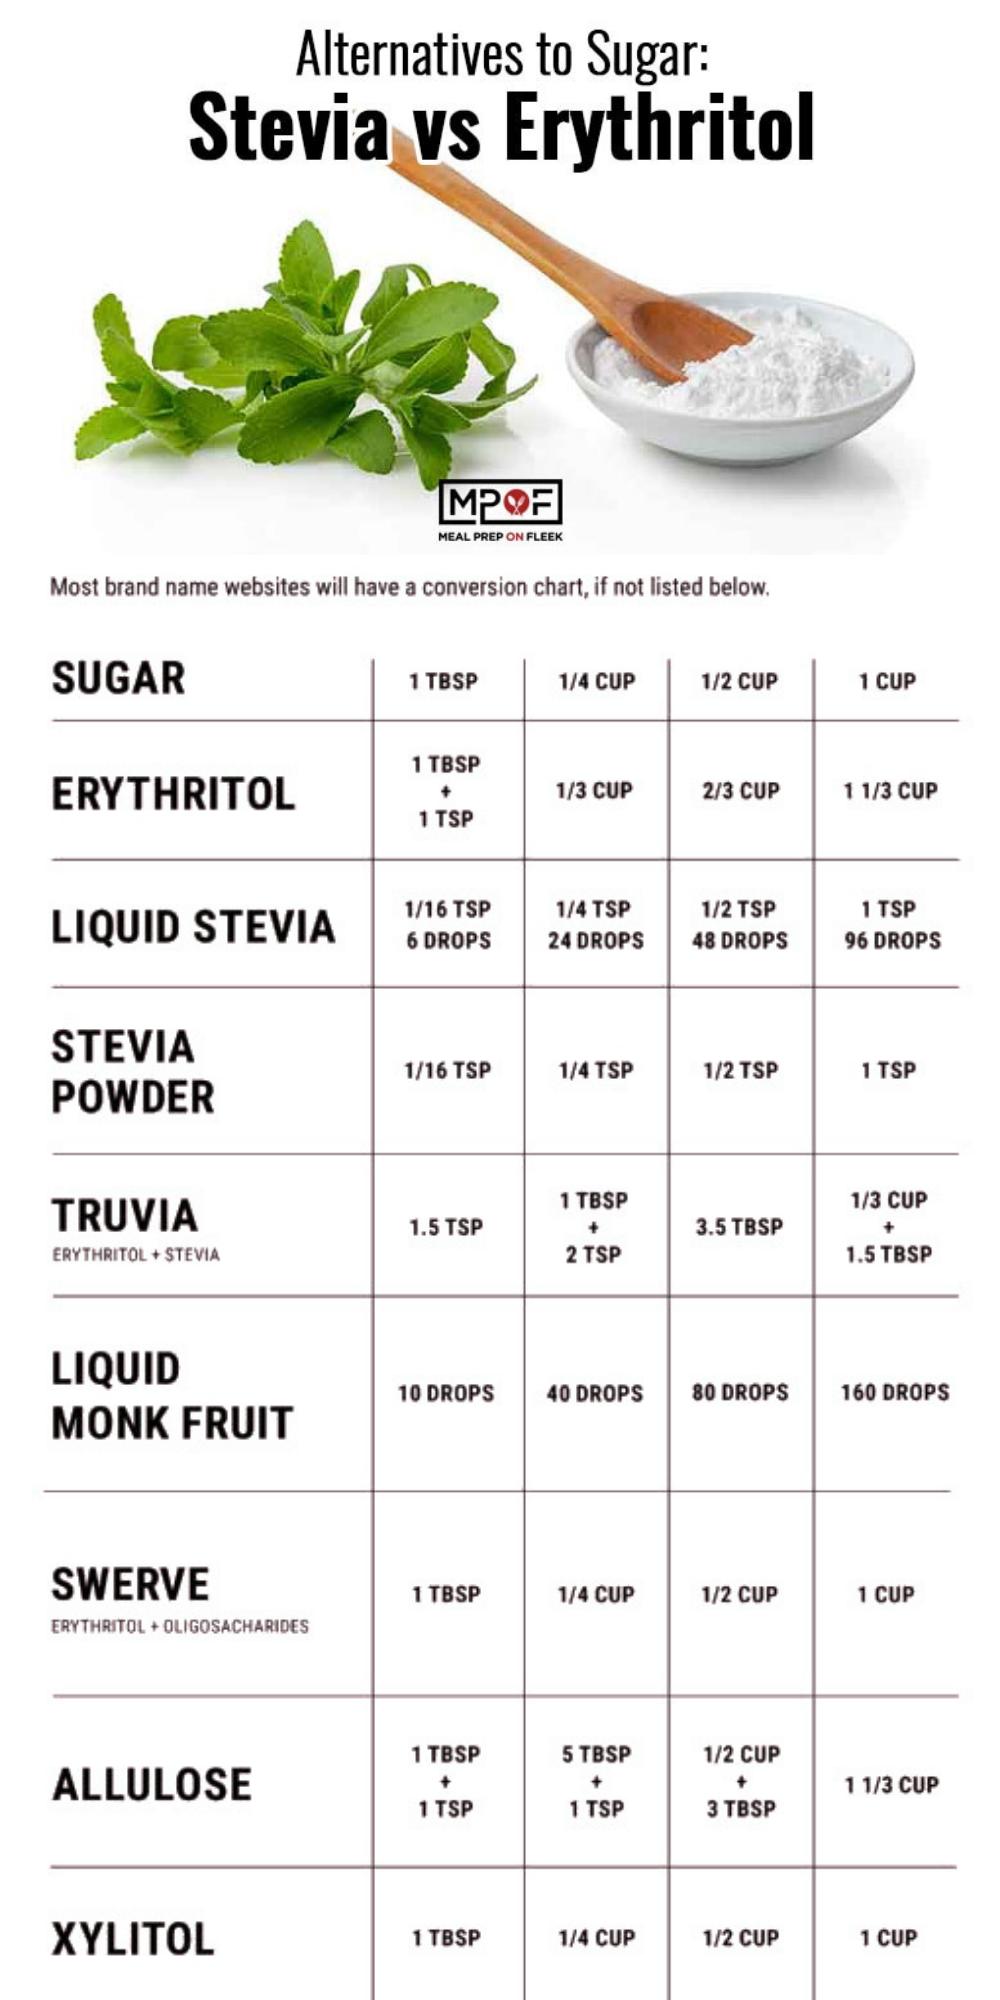 Alternatives to Sugar Conversion Chart